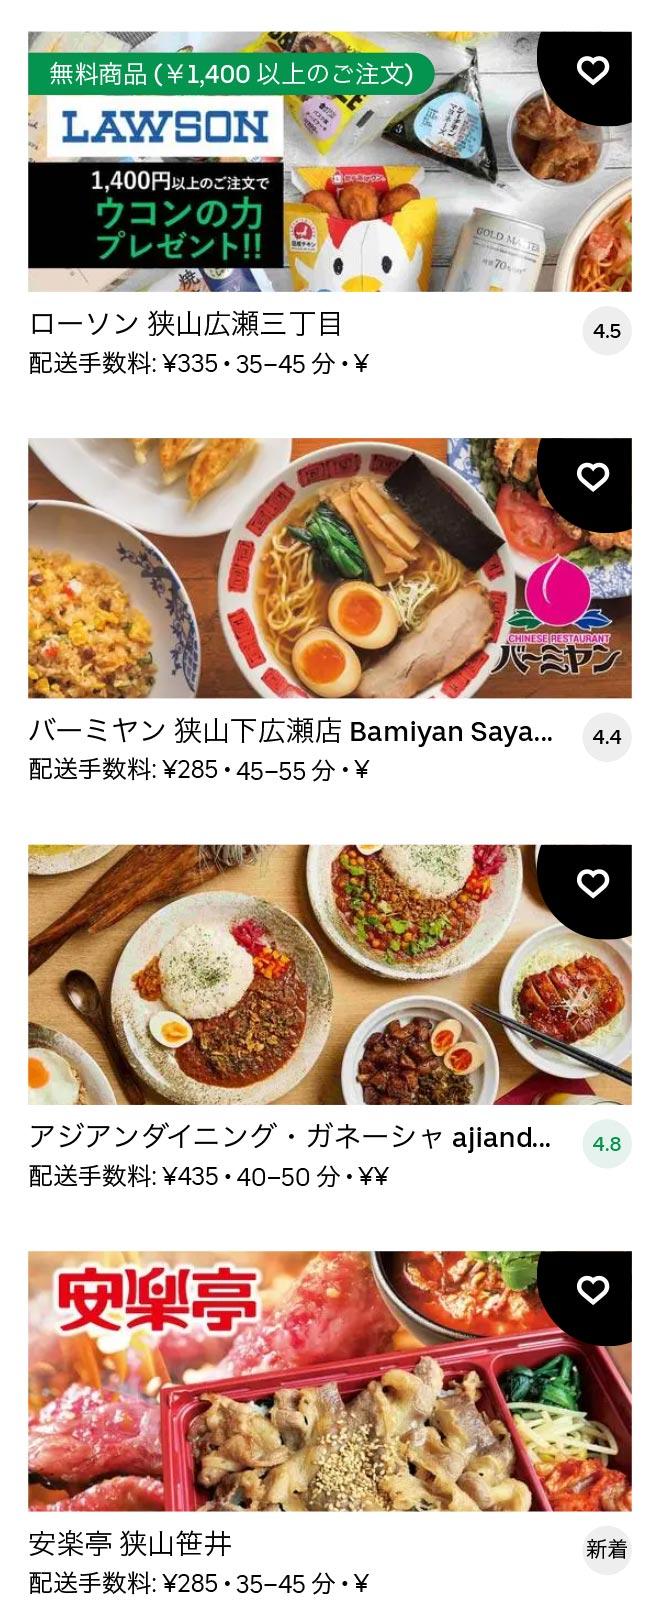 Iruma menu 2101 09